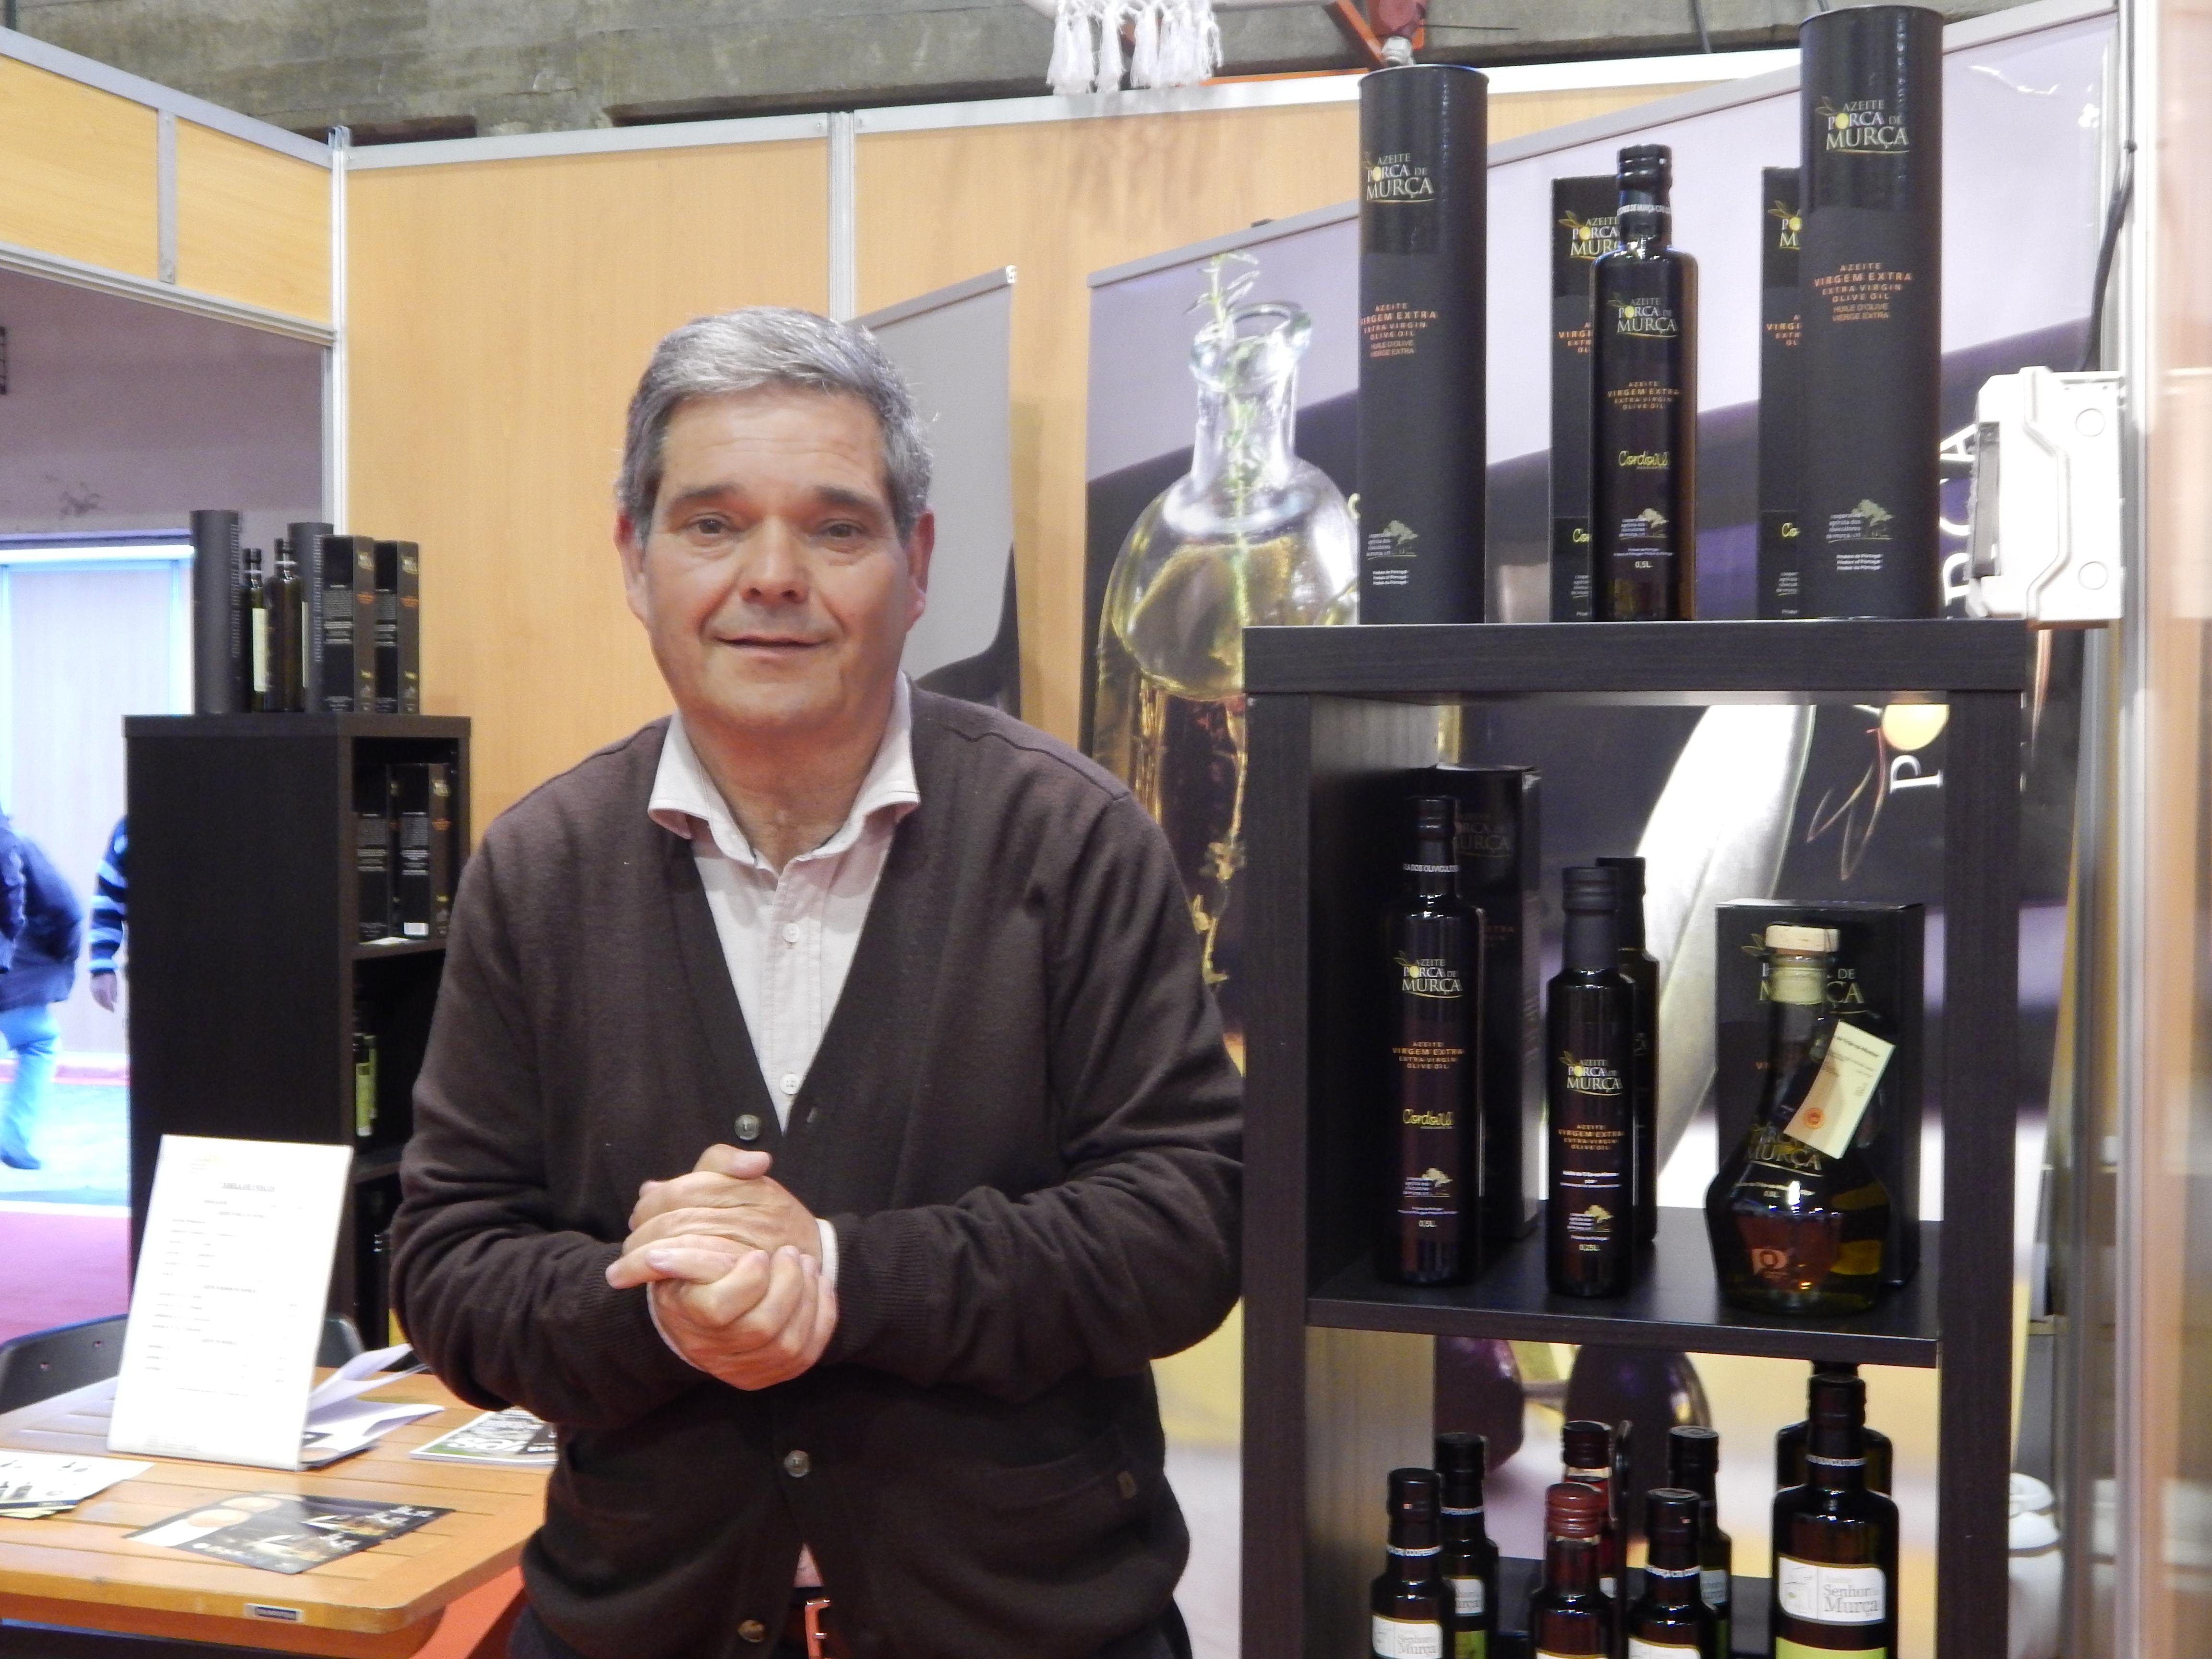 Raul Antonio Ribeiro Luis, Vice-Presidente de la Cámara Municipal de Murça, gran anfitrión durante toda la Feira